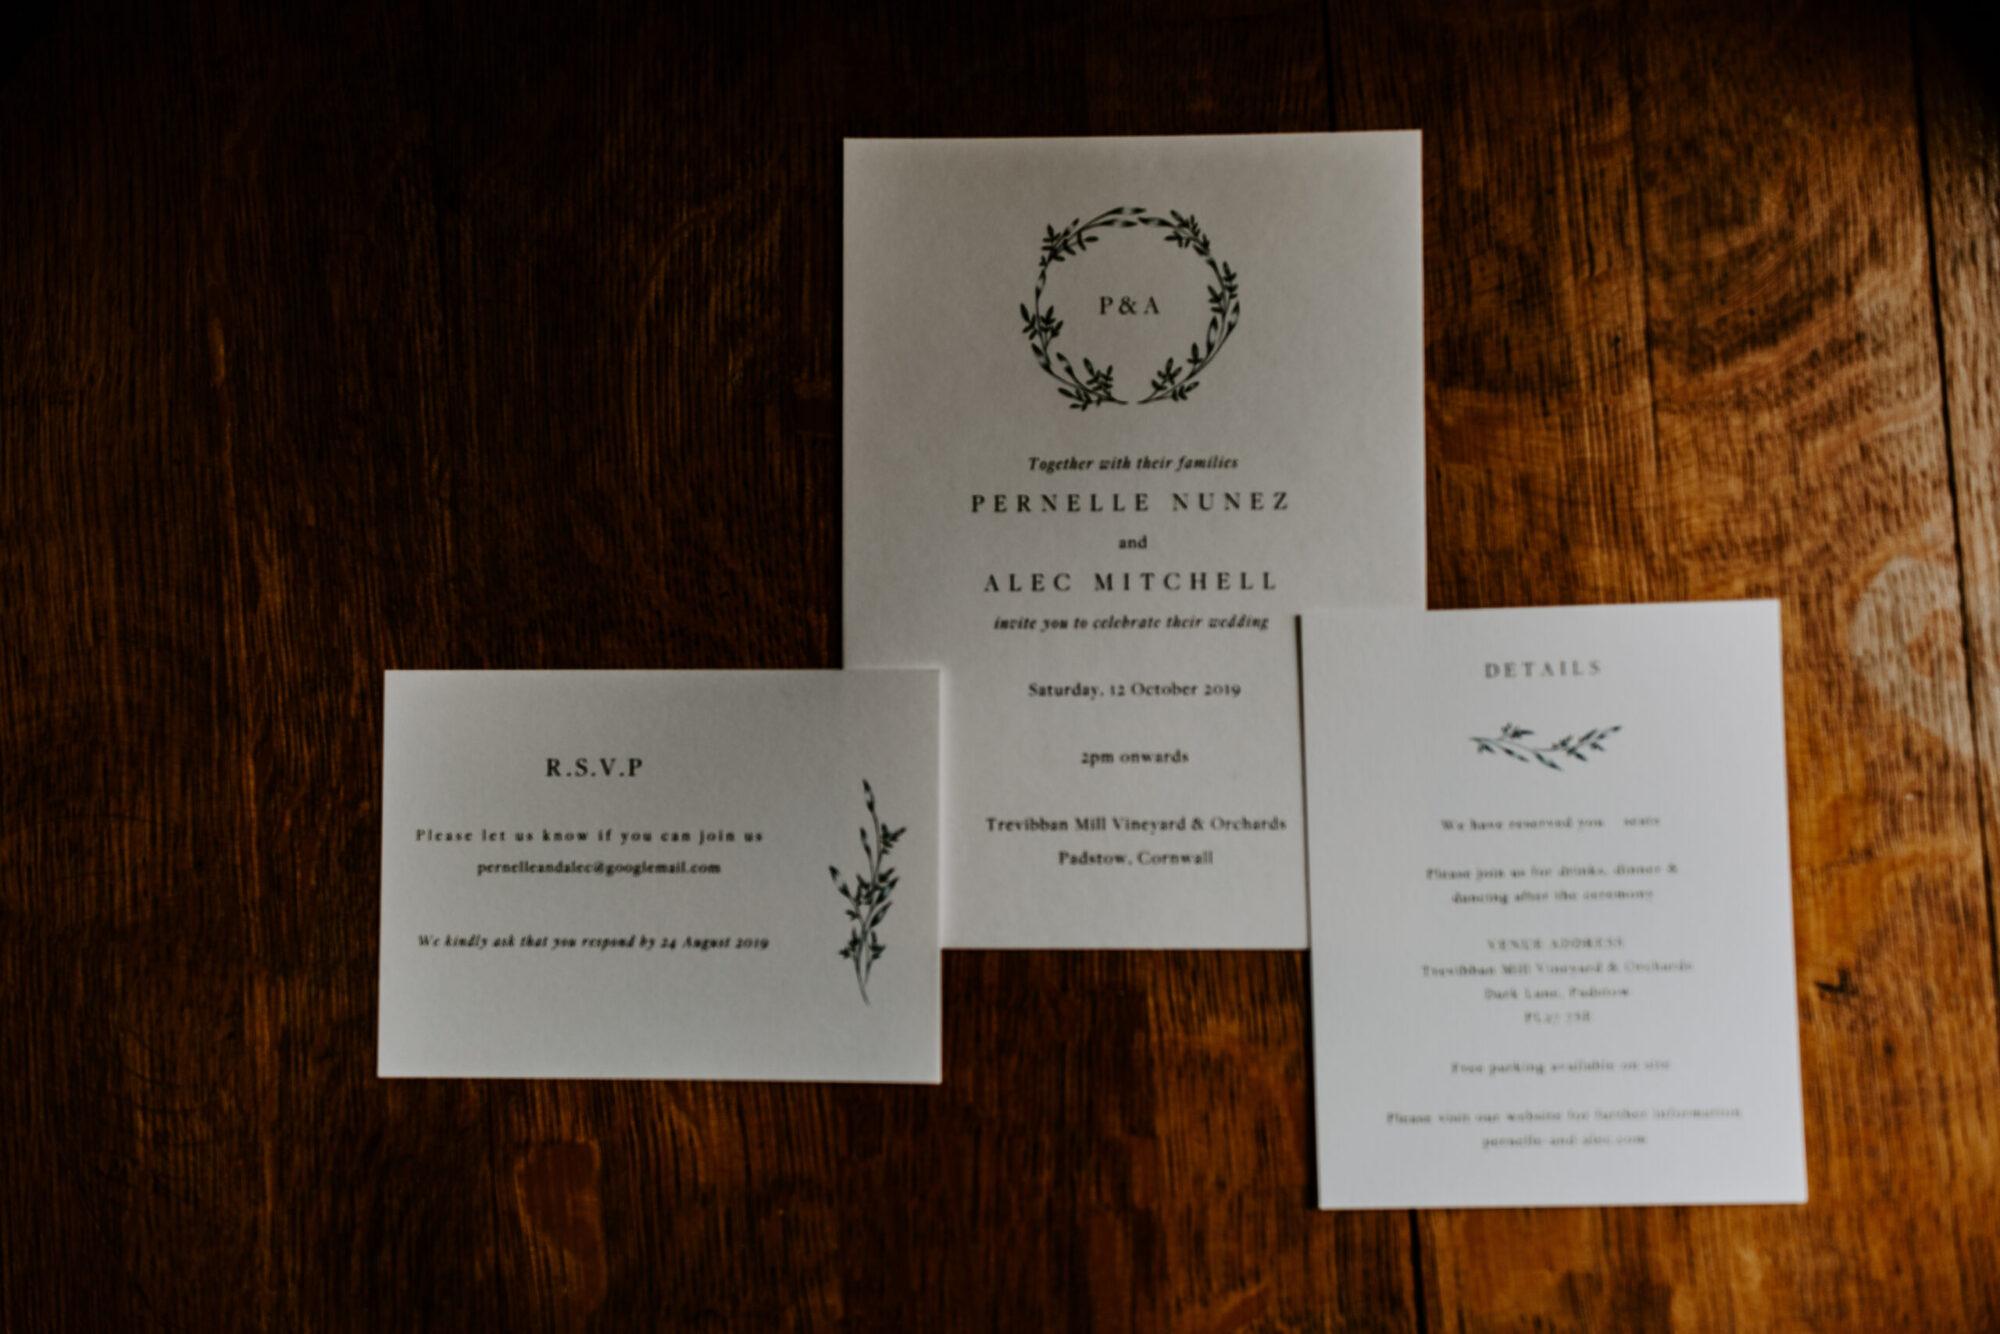 Trevibban Mill Wedding details